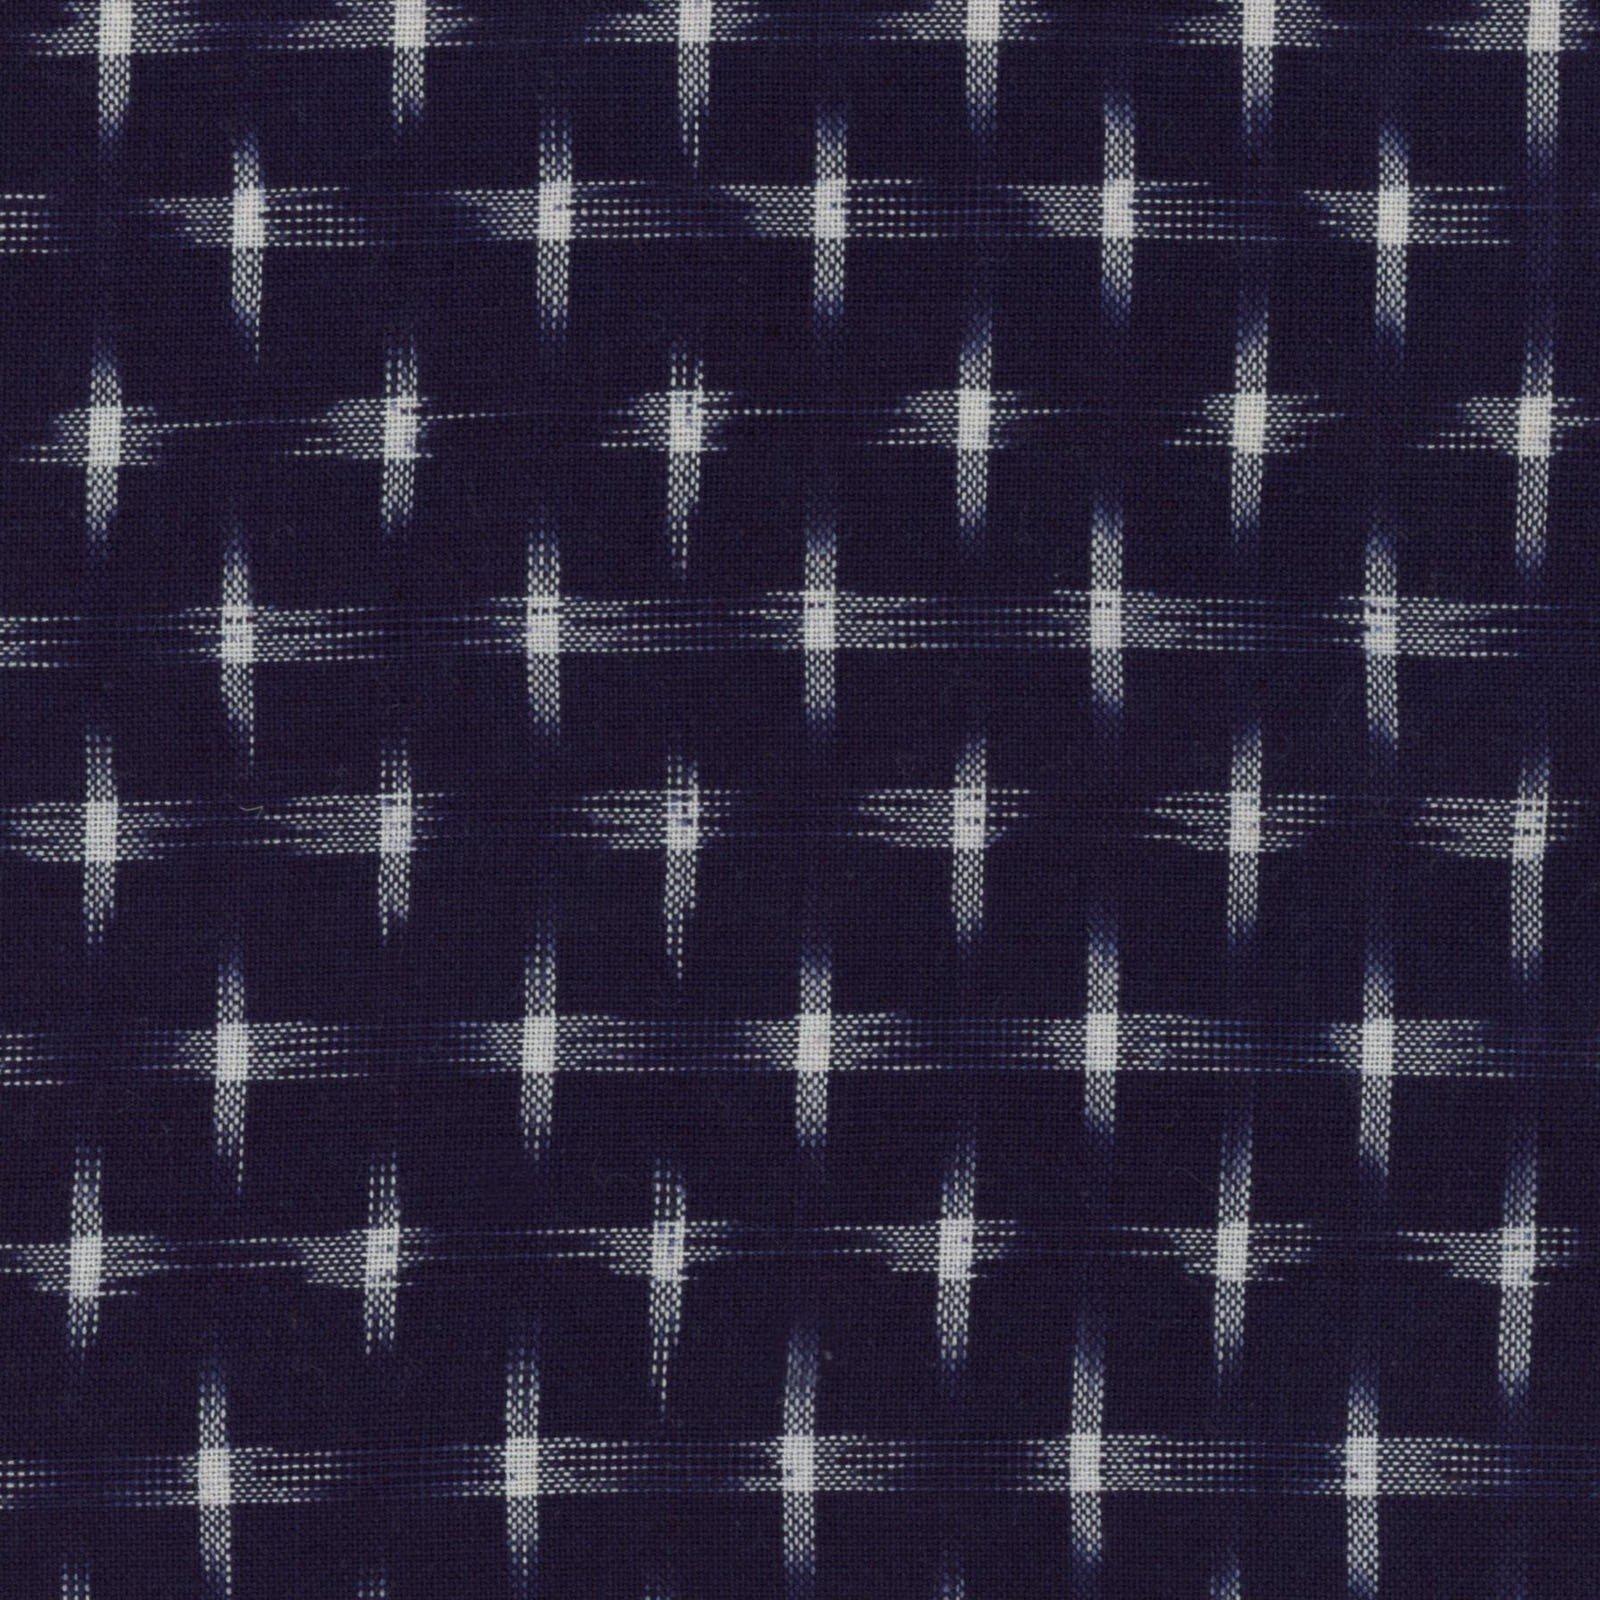 Textile Creations - Dakota - Ikat Star - Navy/Cream